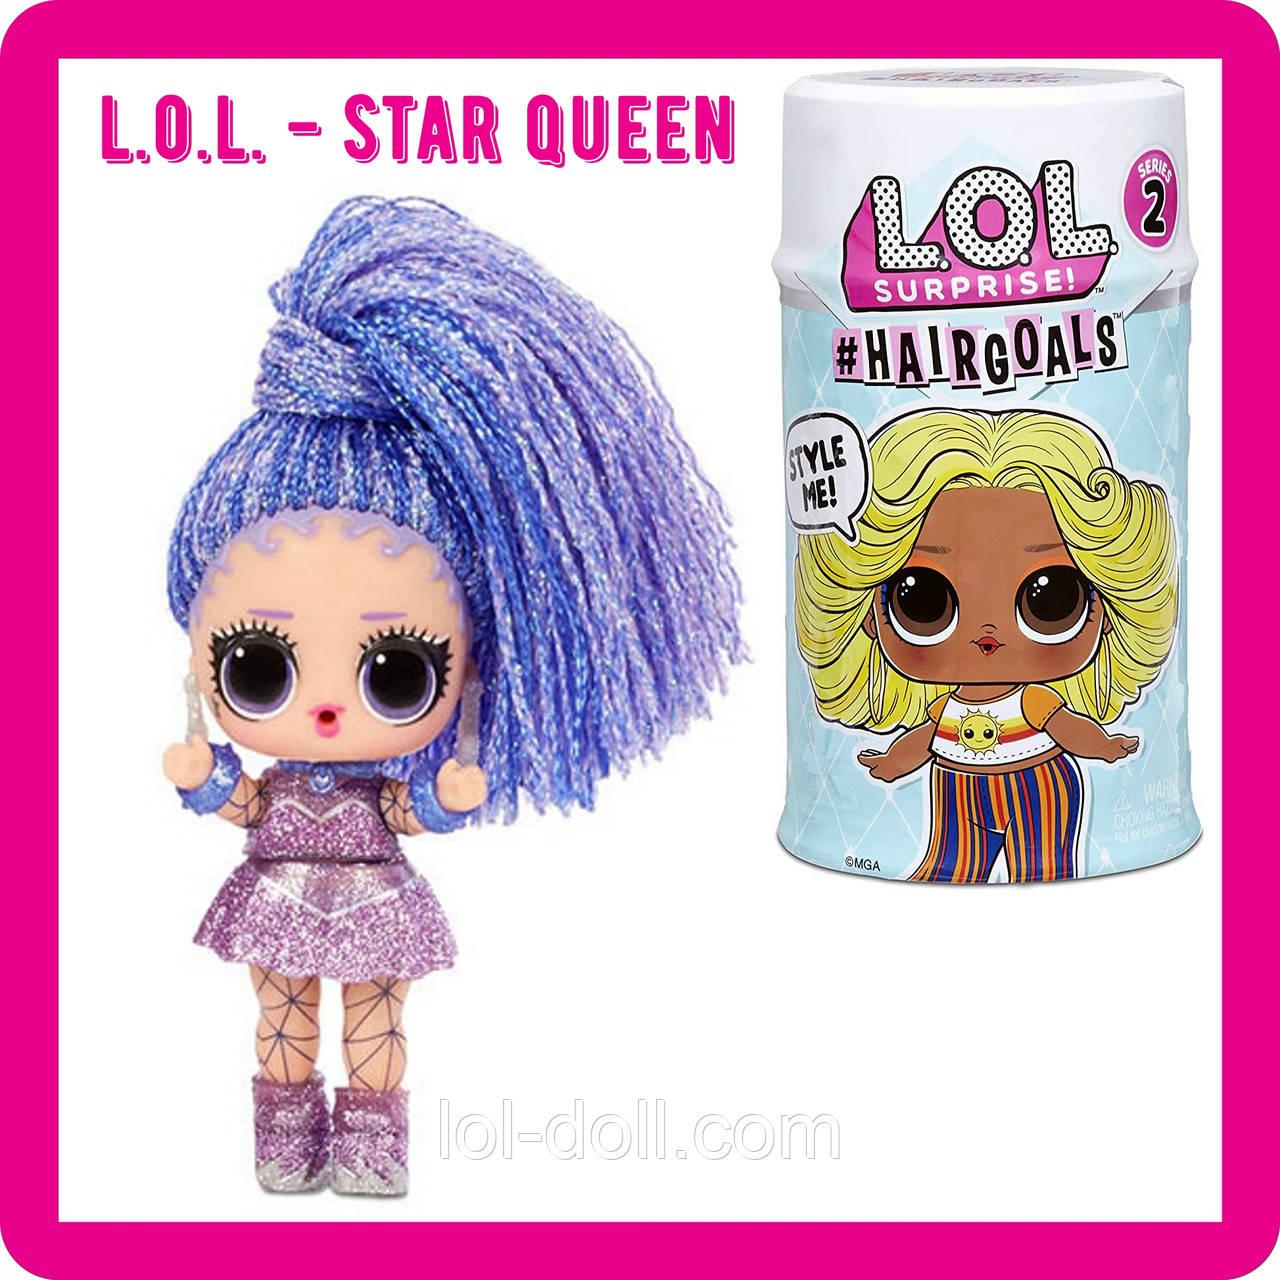 Кукла ЛОЛ Star Queen LOL Surprise Оригинал Hairgoals 2 серия Хеиргоалс